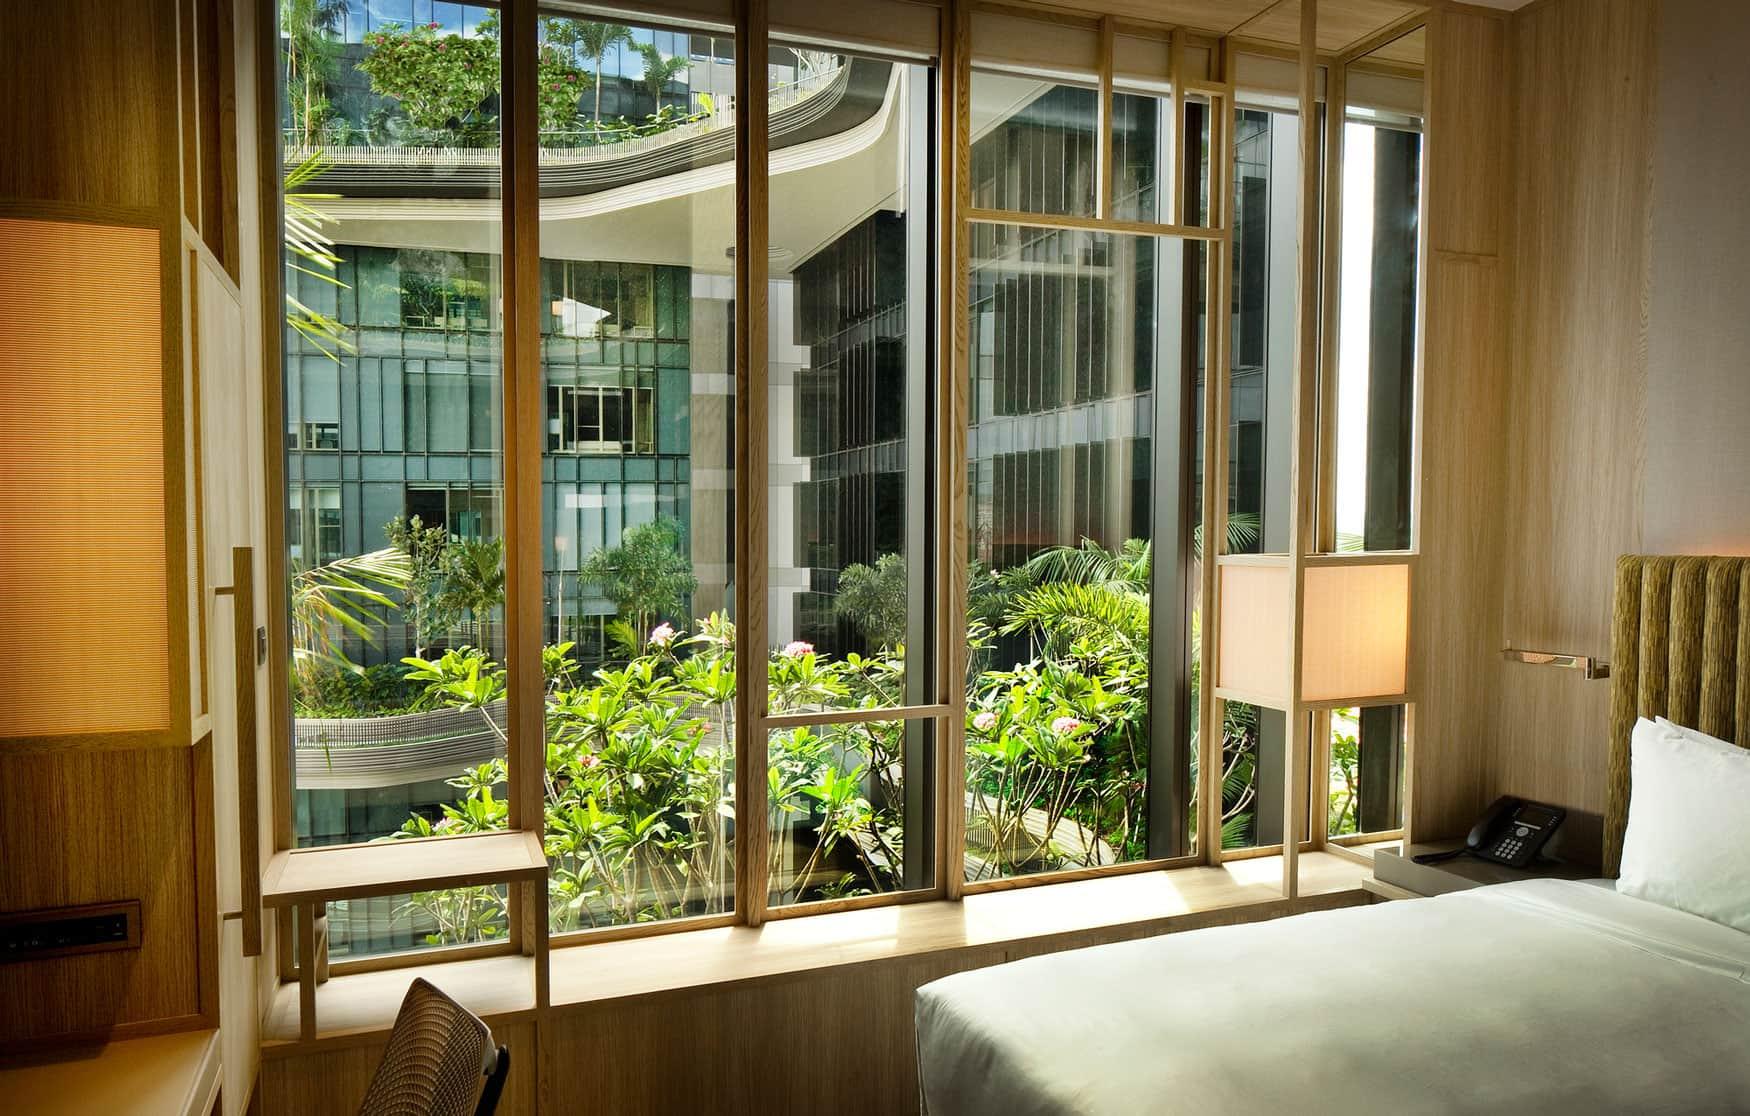 ParkRoyal Hotel Singapore